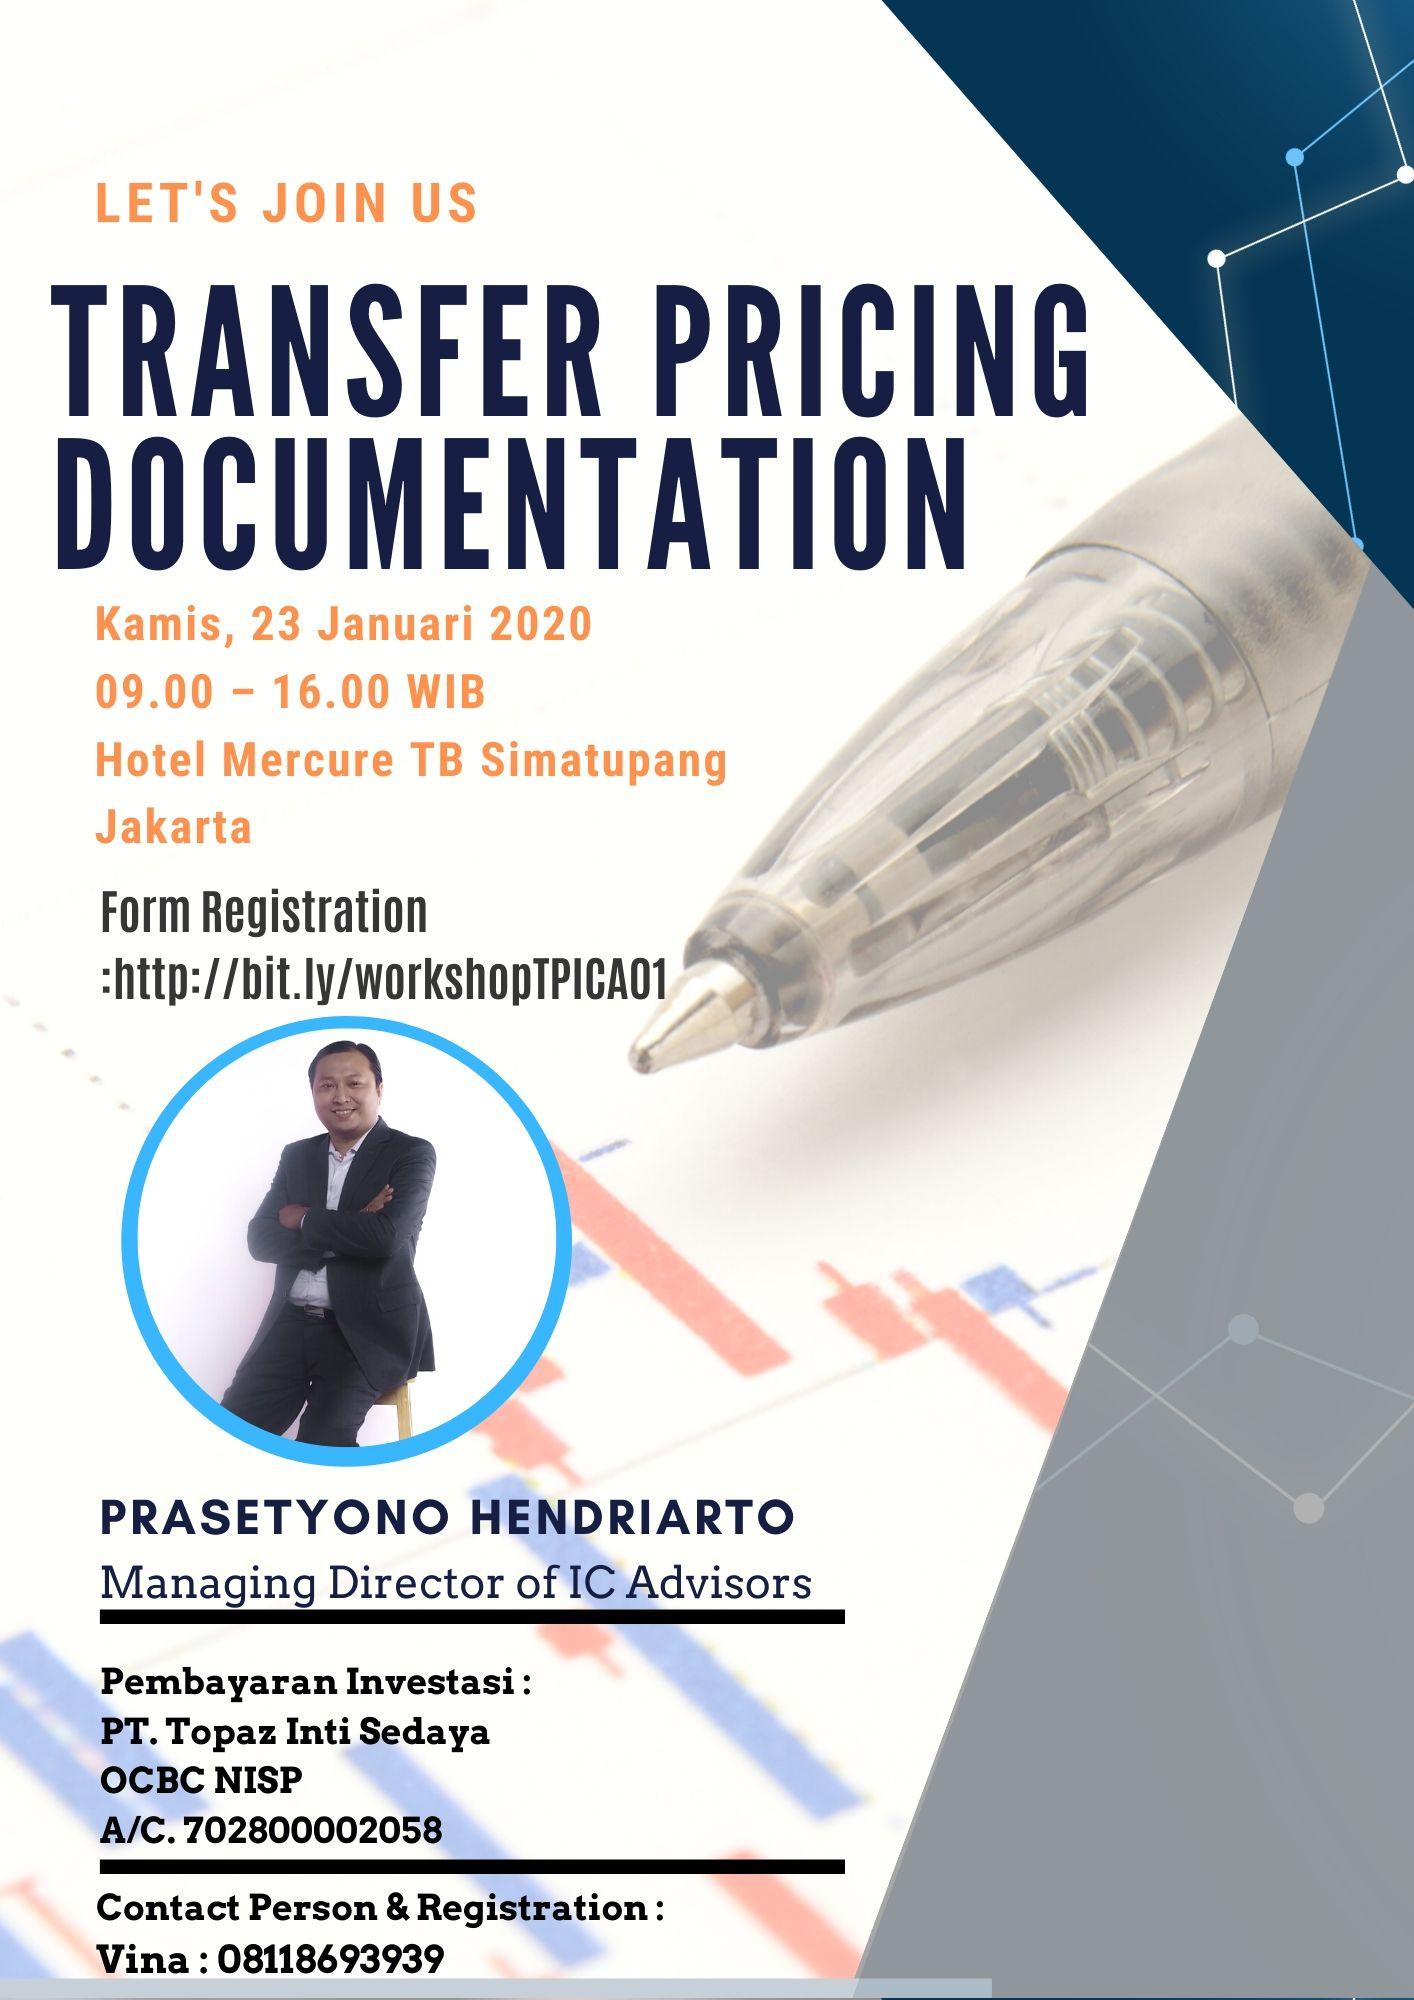 SEMINAR TRANSFER PRICING